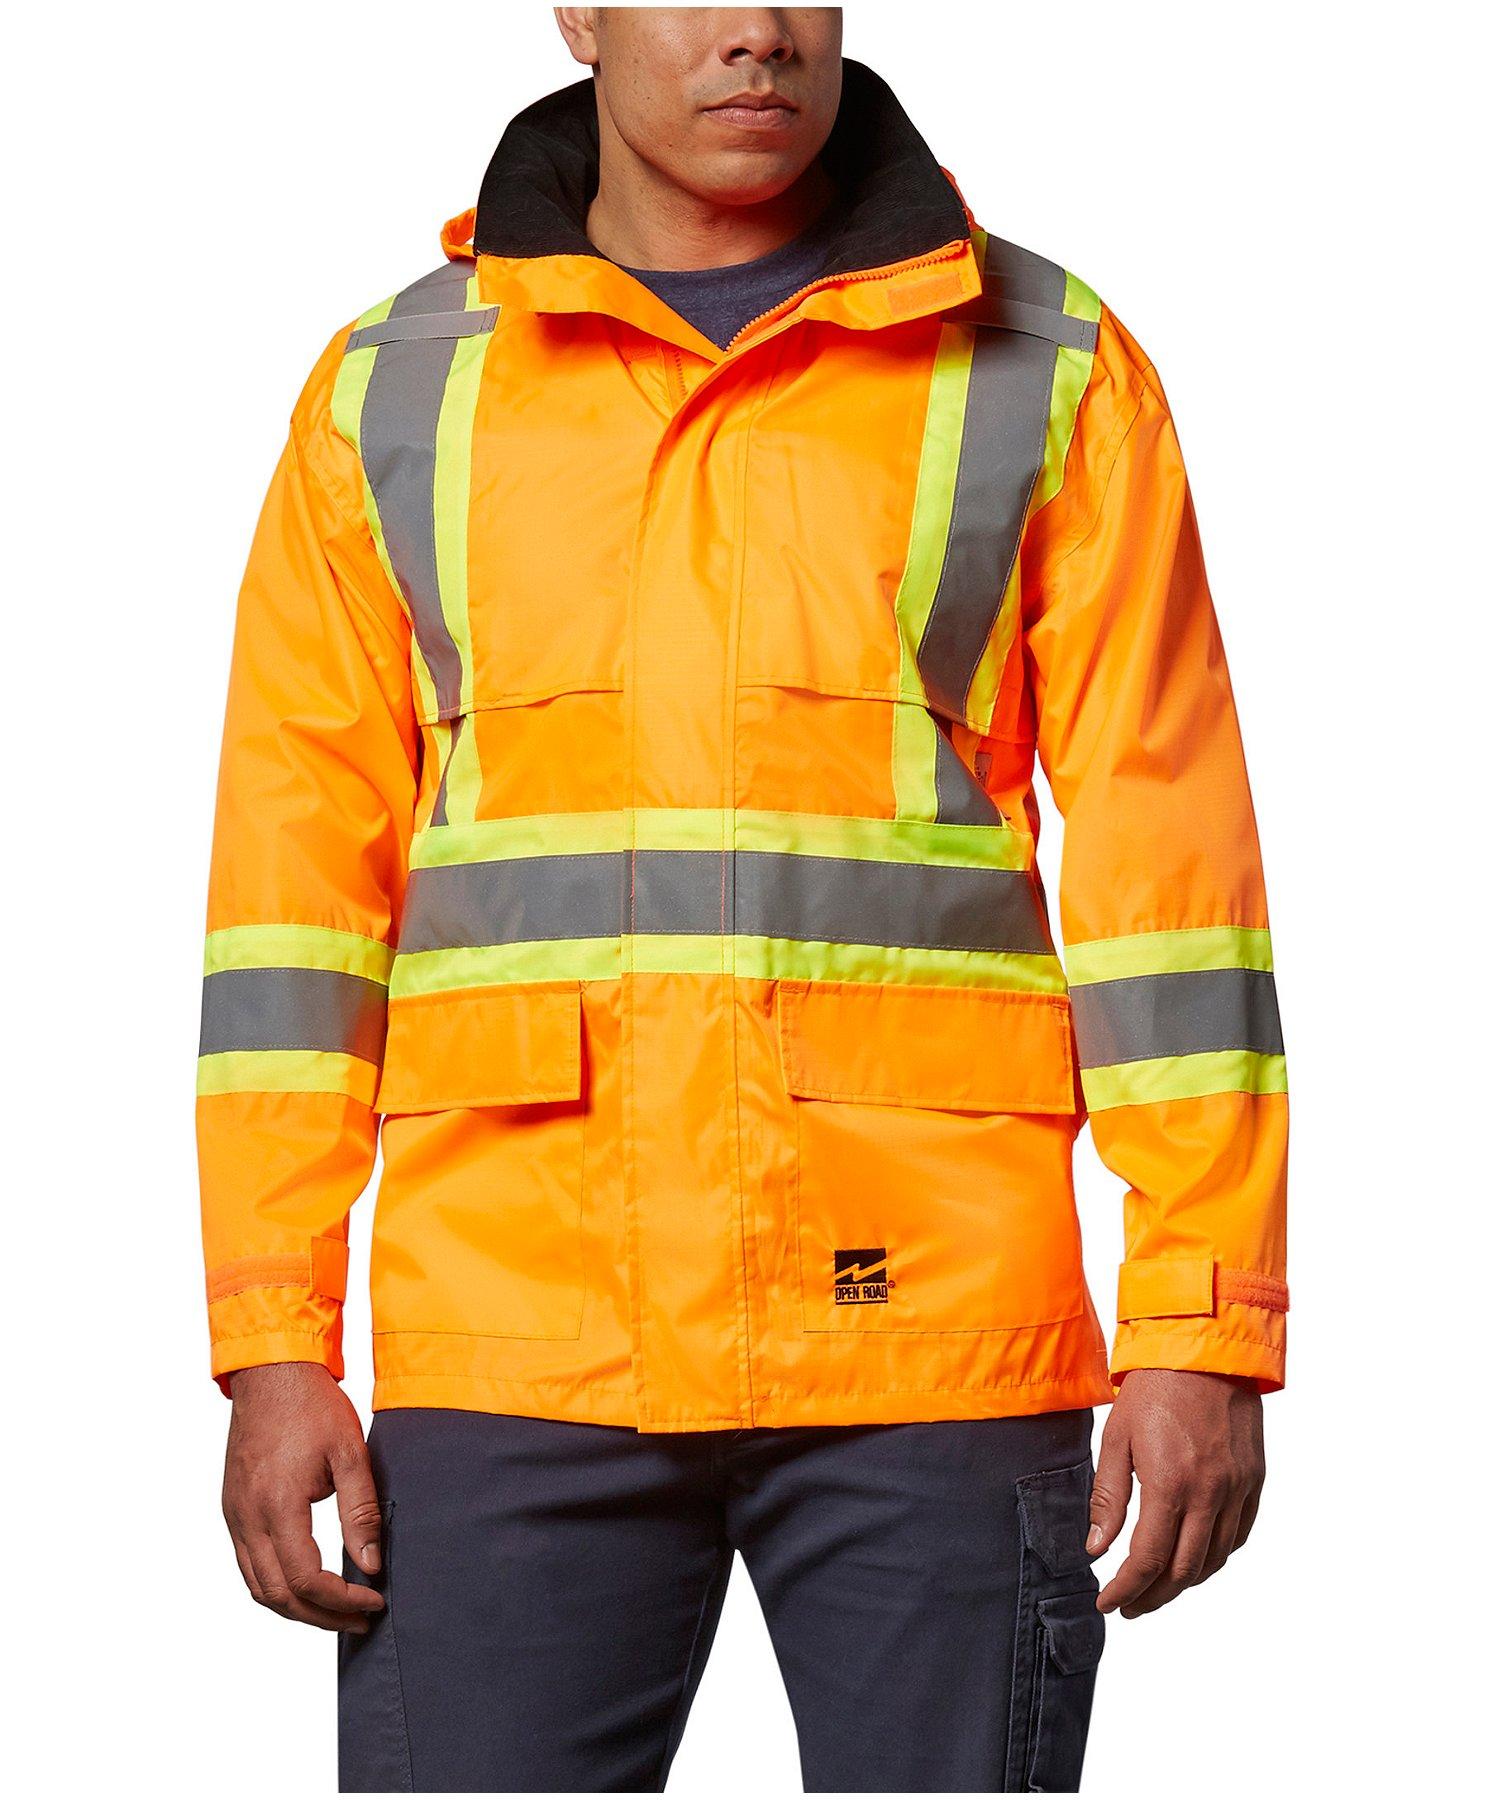 Viking Open Road 150D Hi-Vis Waterproof Rain Jacket